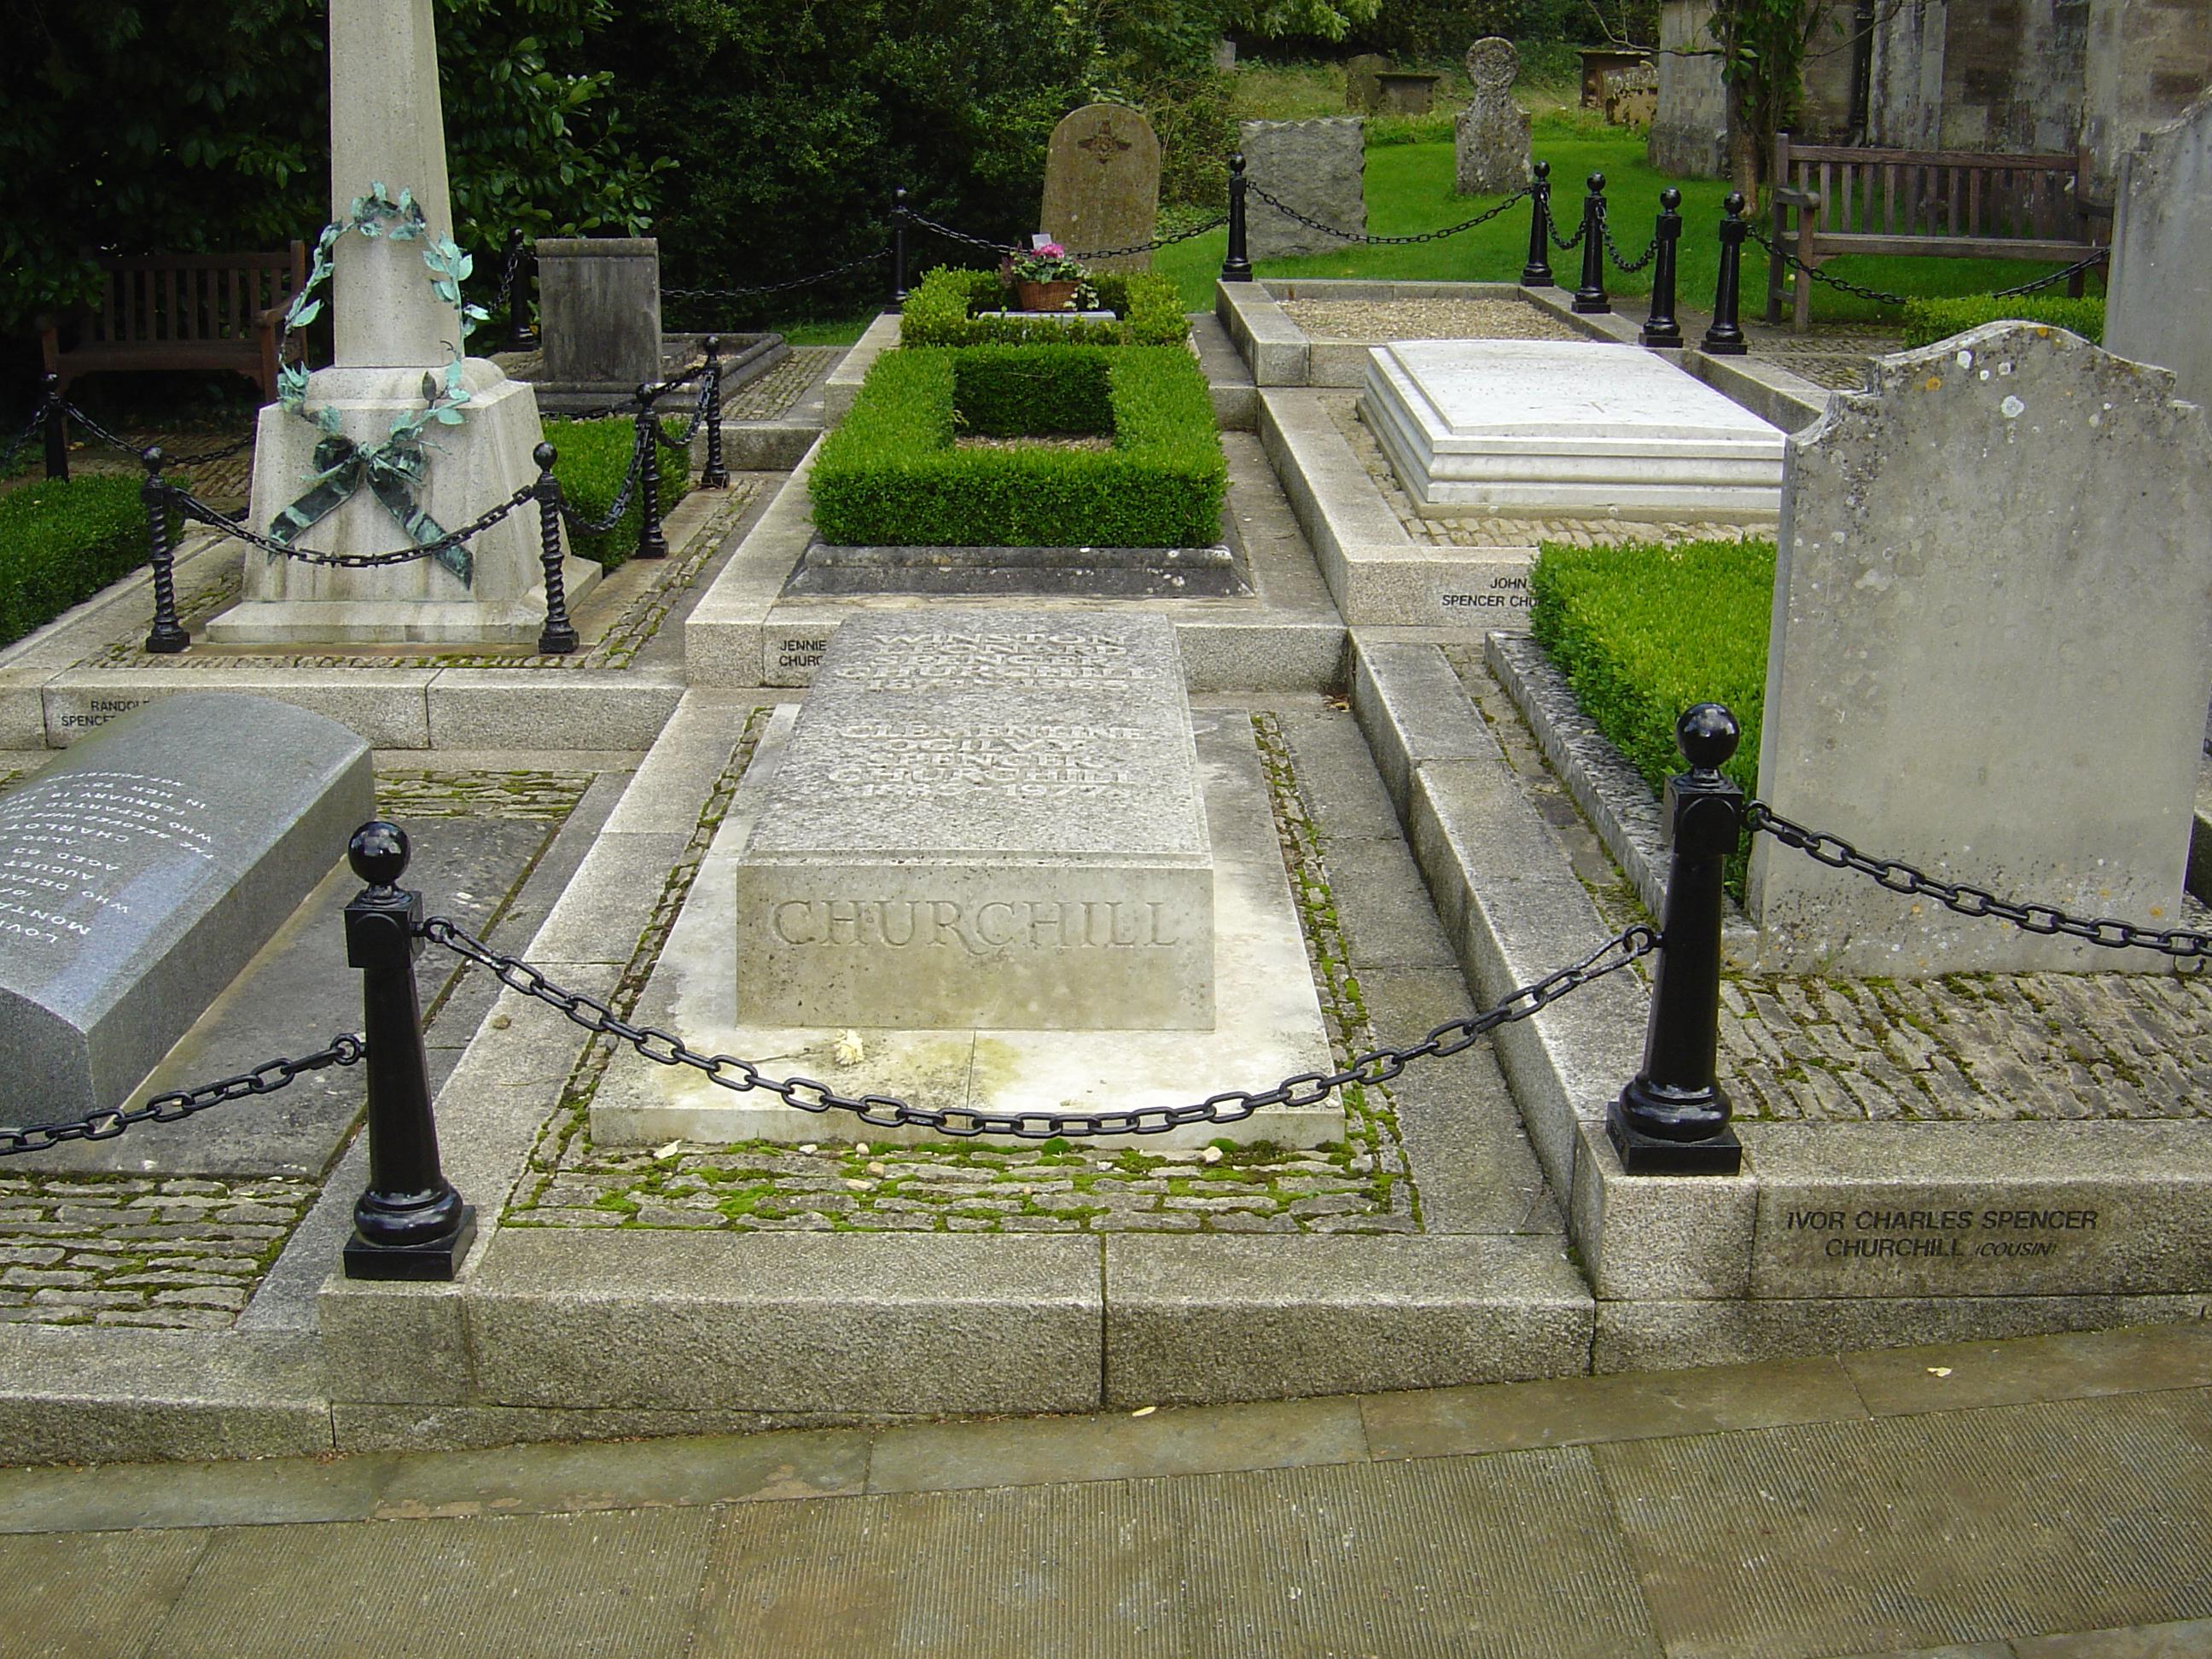 Churchill's grave at St Martin's Church, Bladon. Photo taken on October 1, 2004.